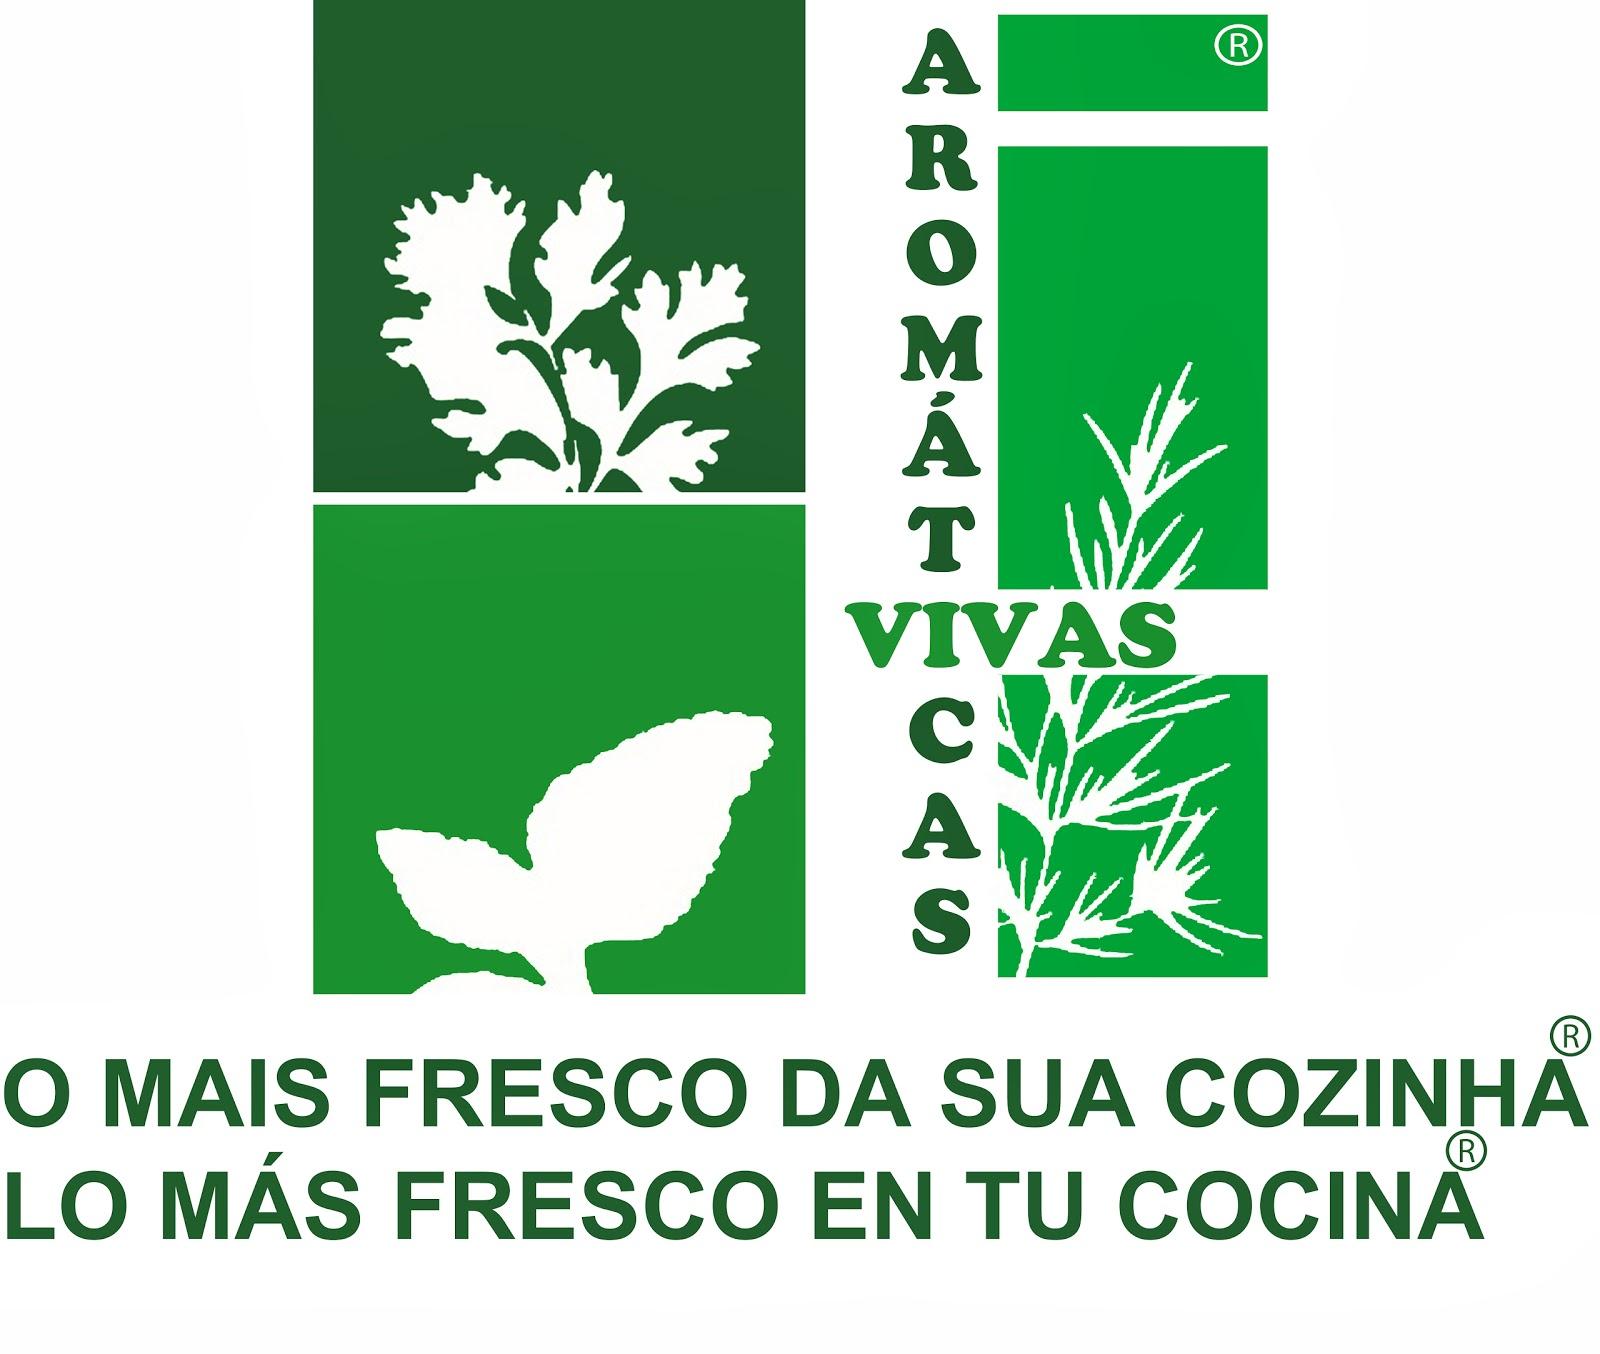 http://www.aromaticasvivas.com/default.aspx